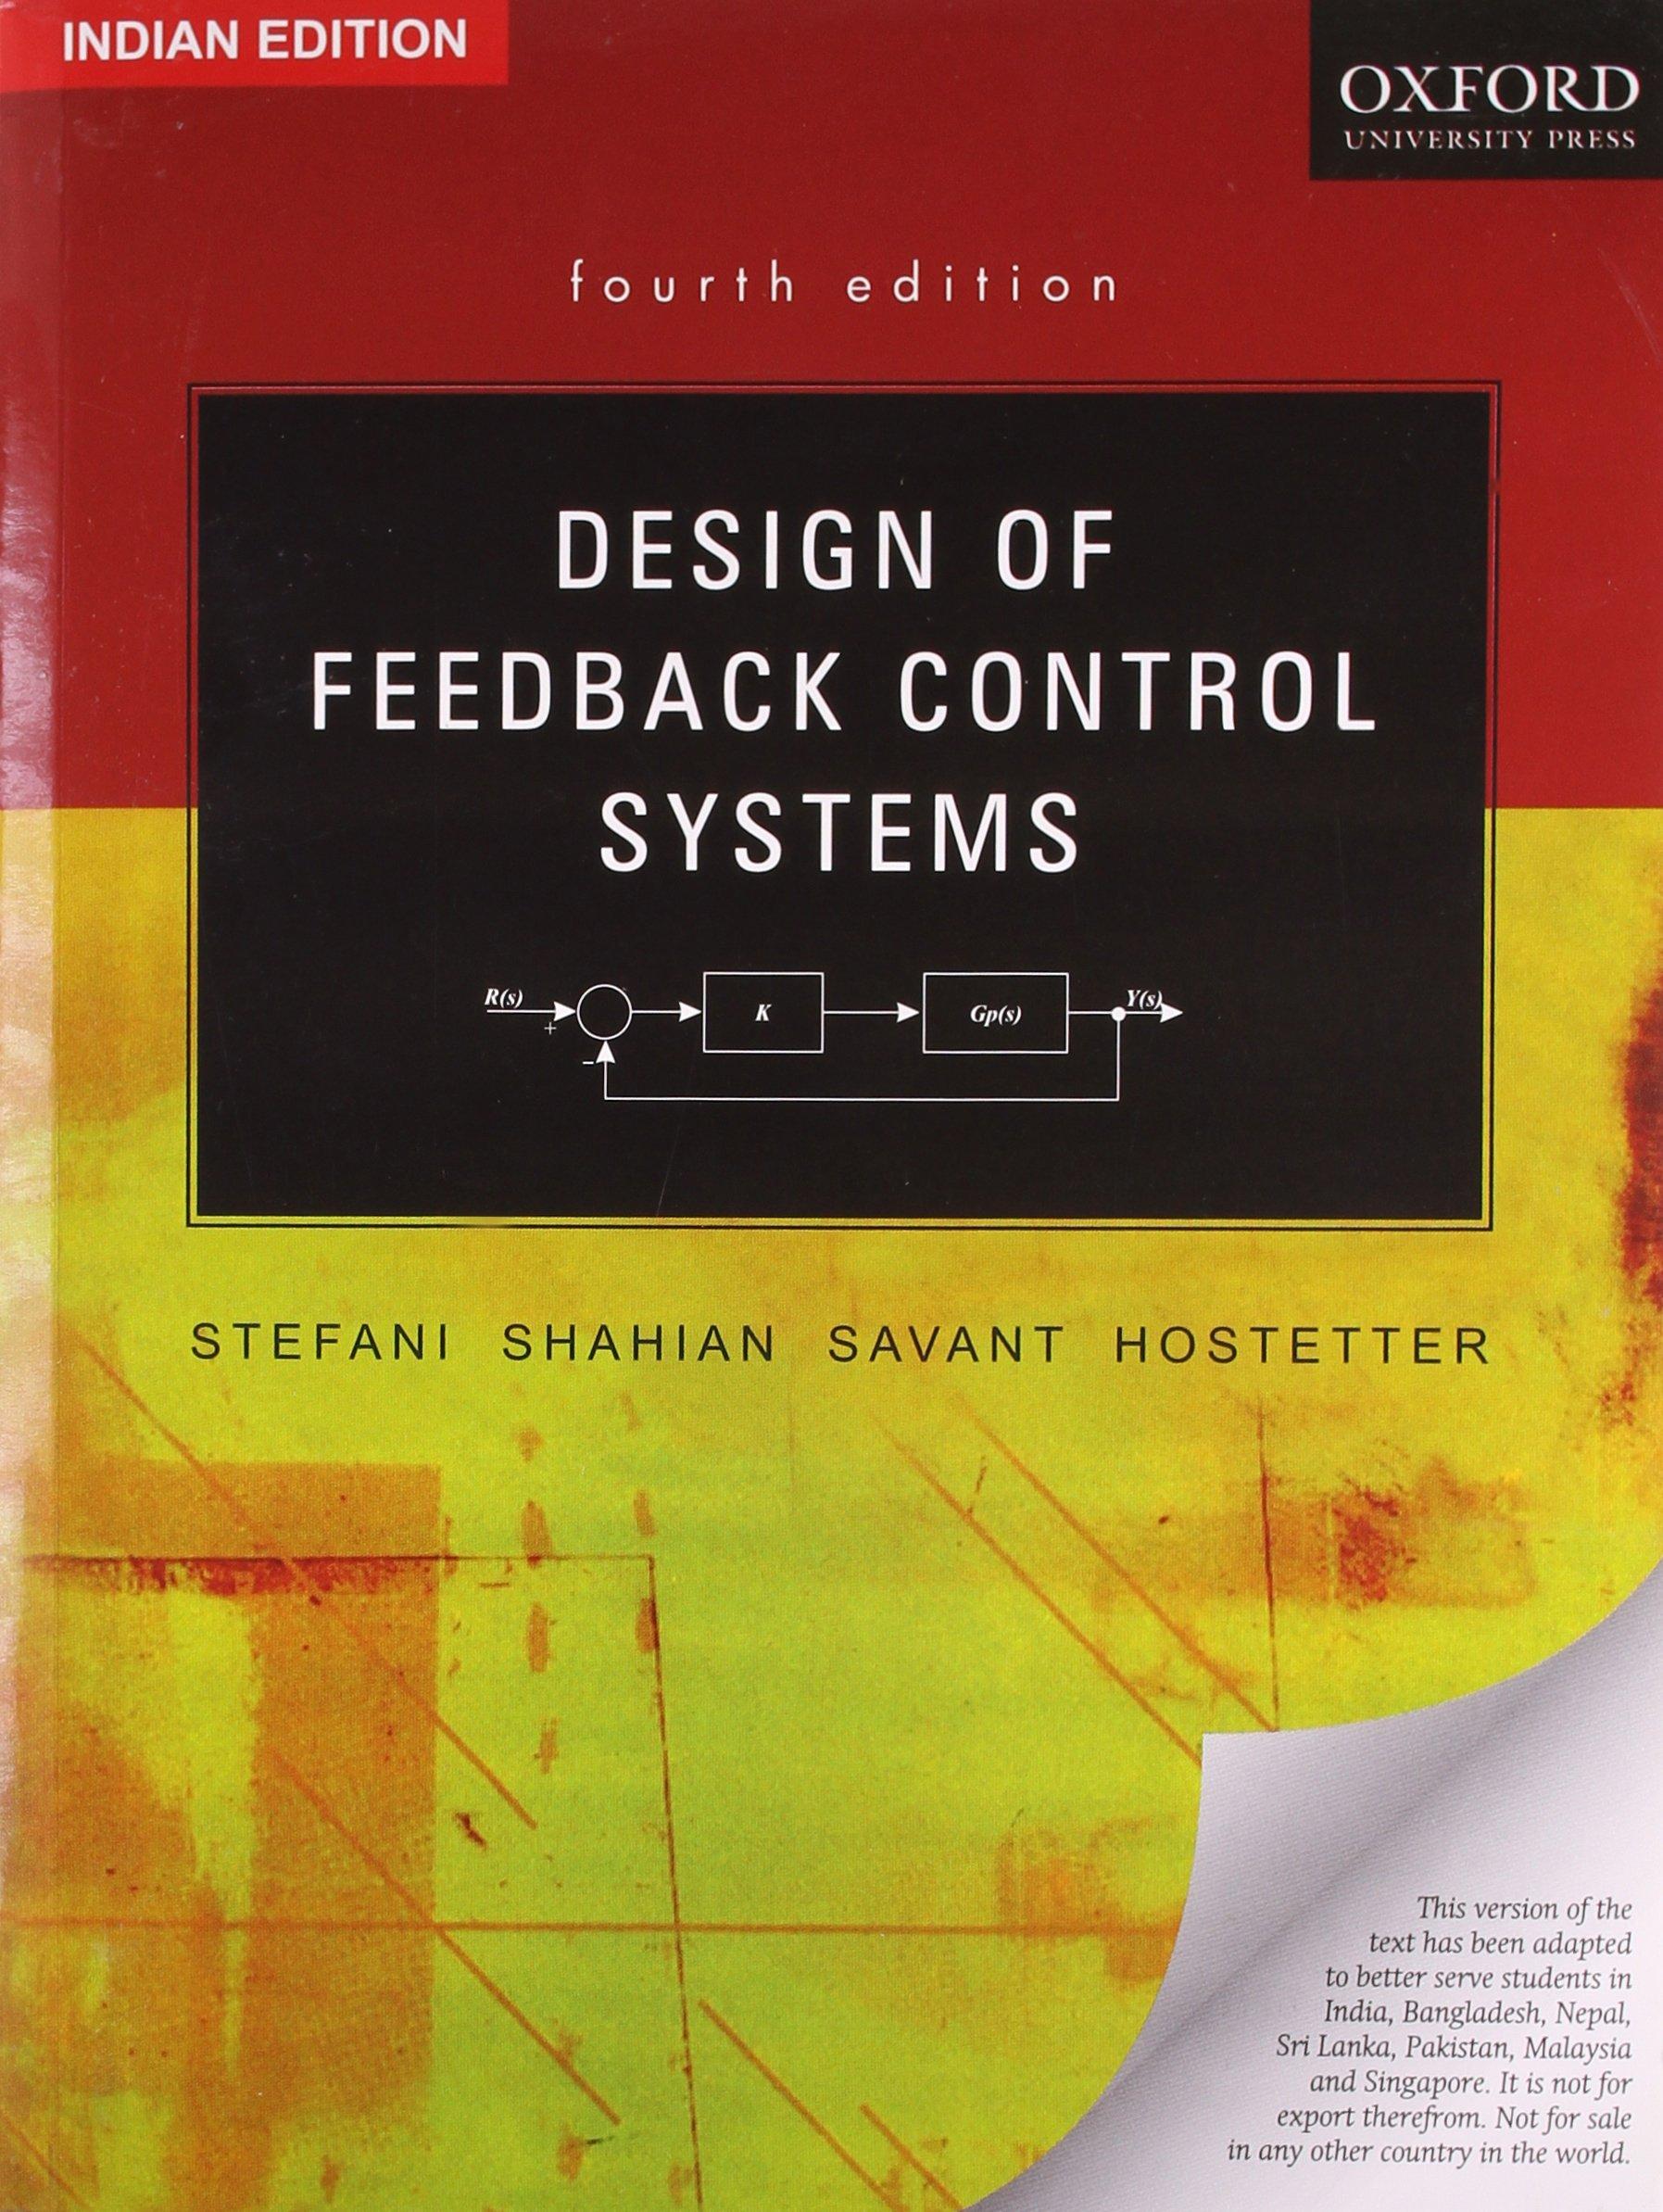 Design Of Feedback Control Systems 4th Ed Stefani 9780195682830 Books Amazon Ca